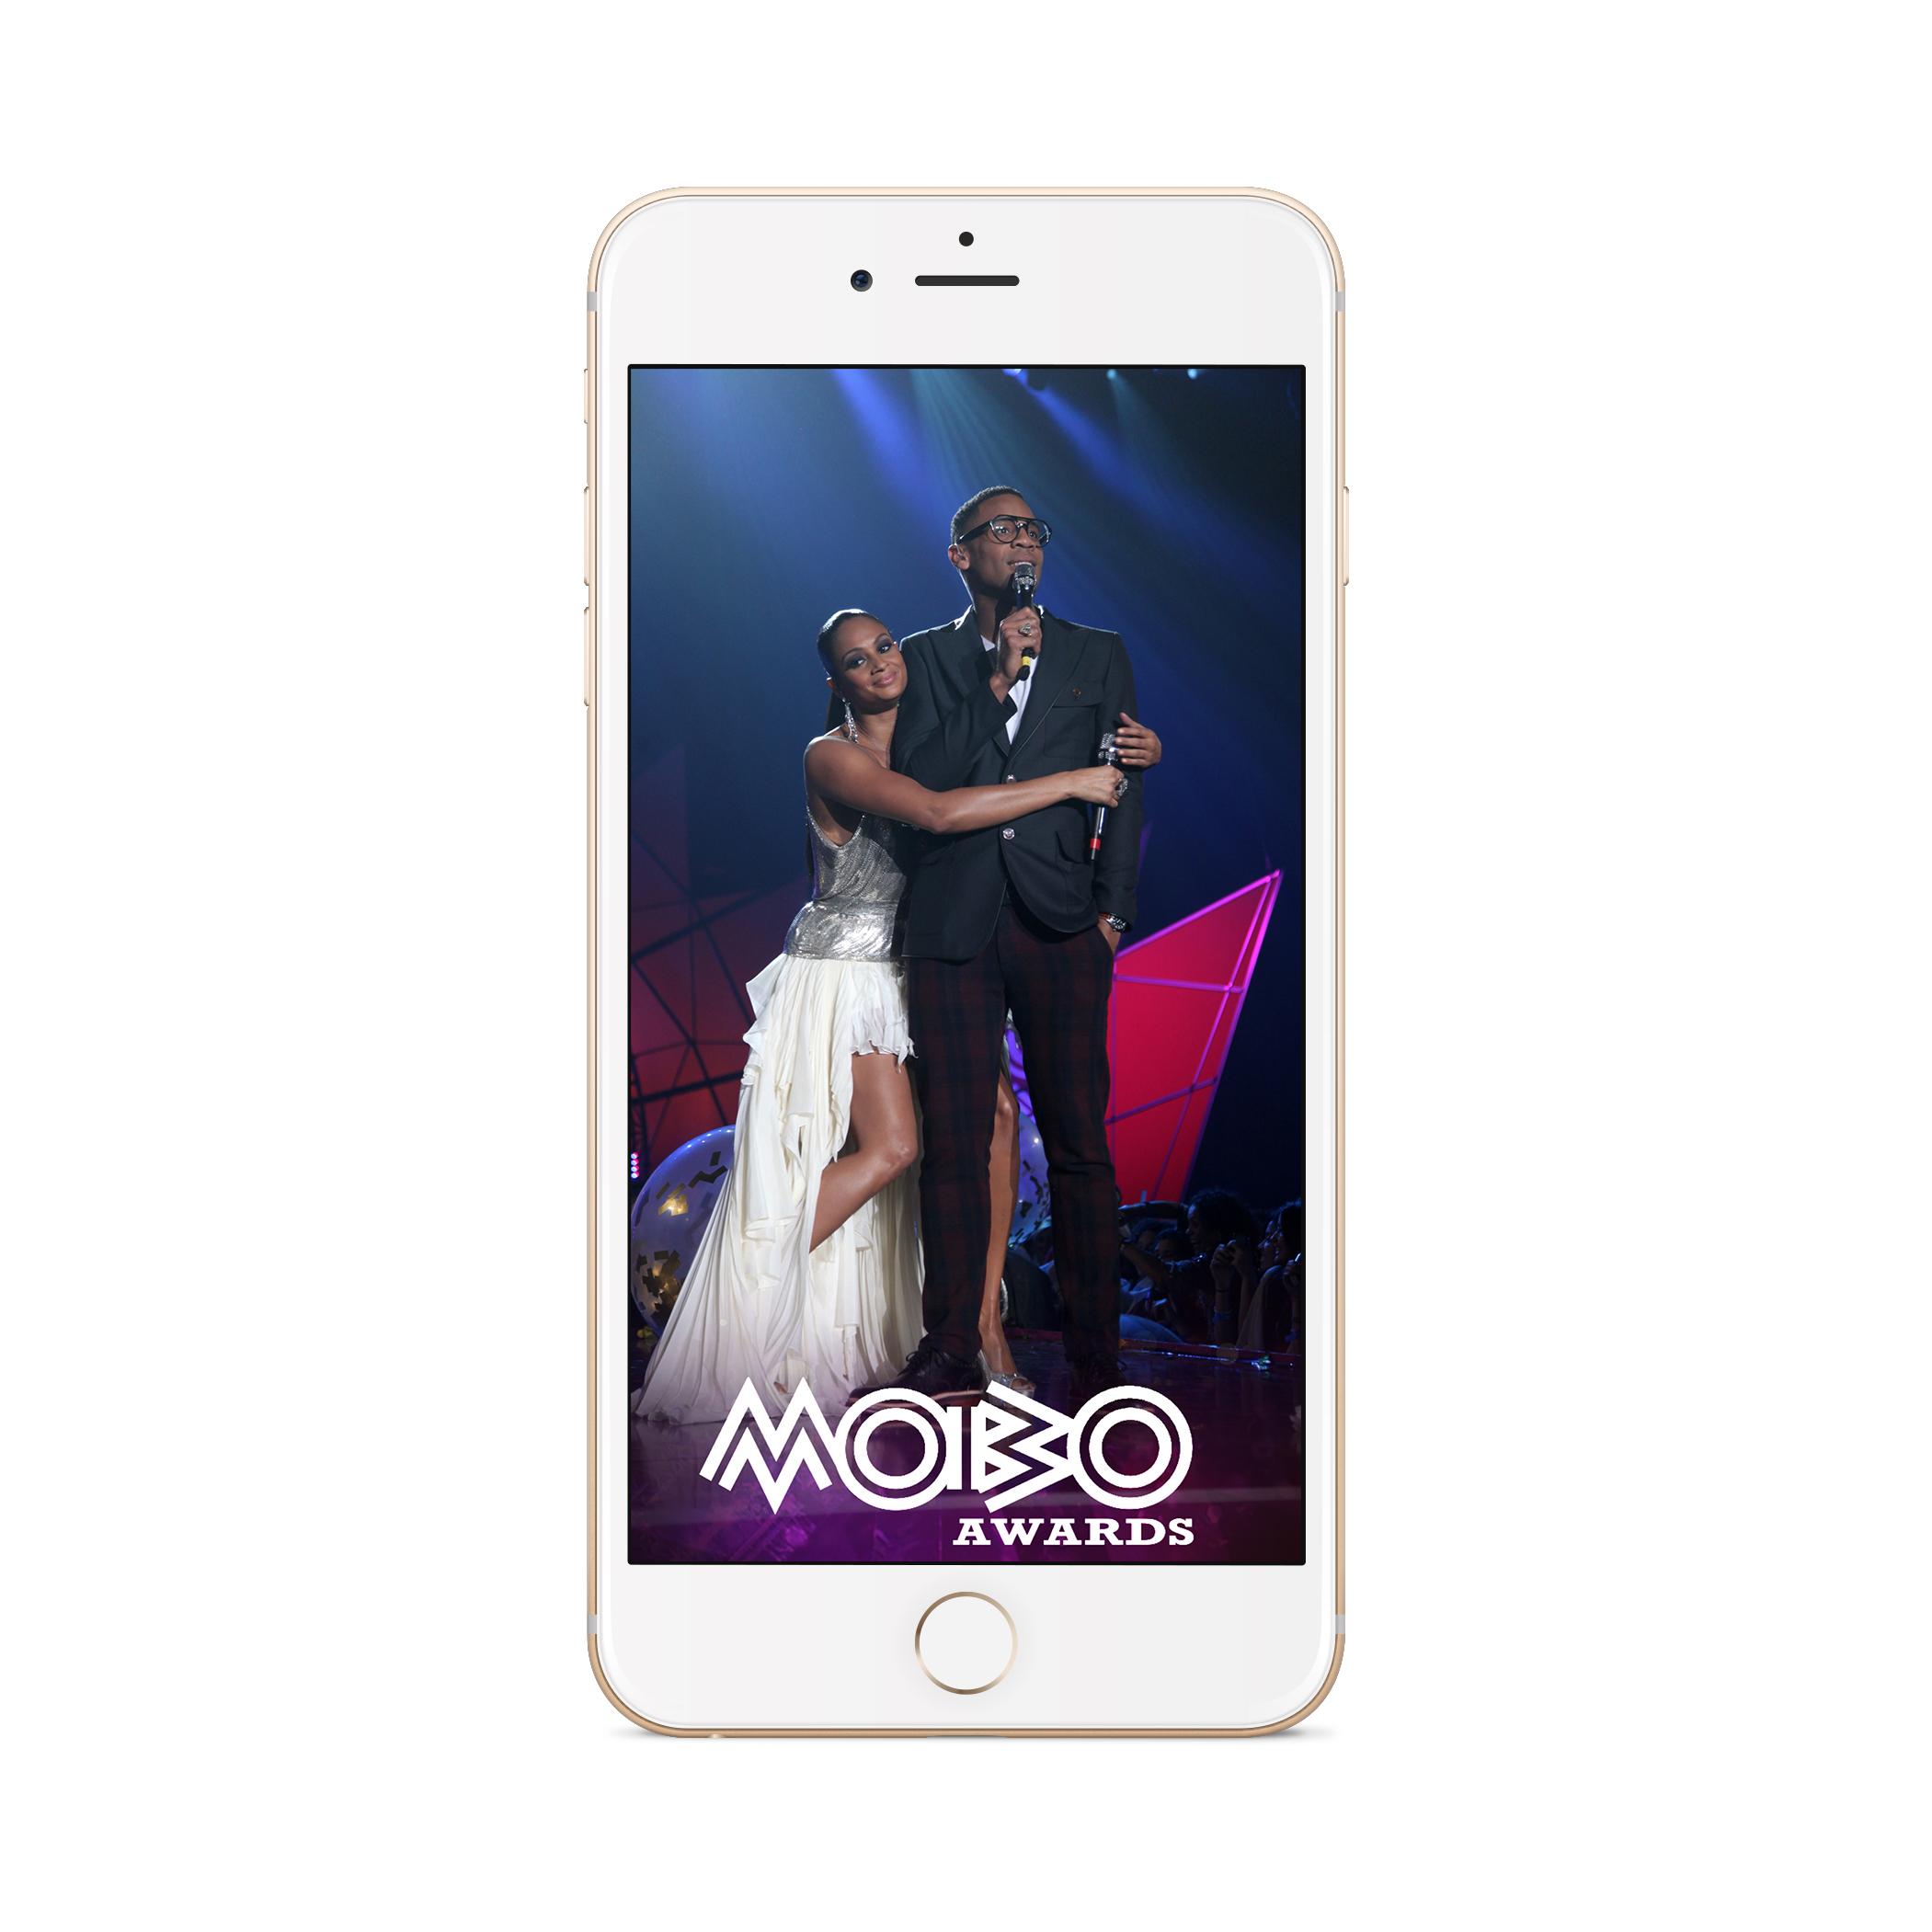 Mobo Awards Filter